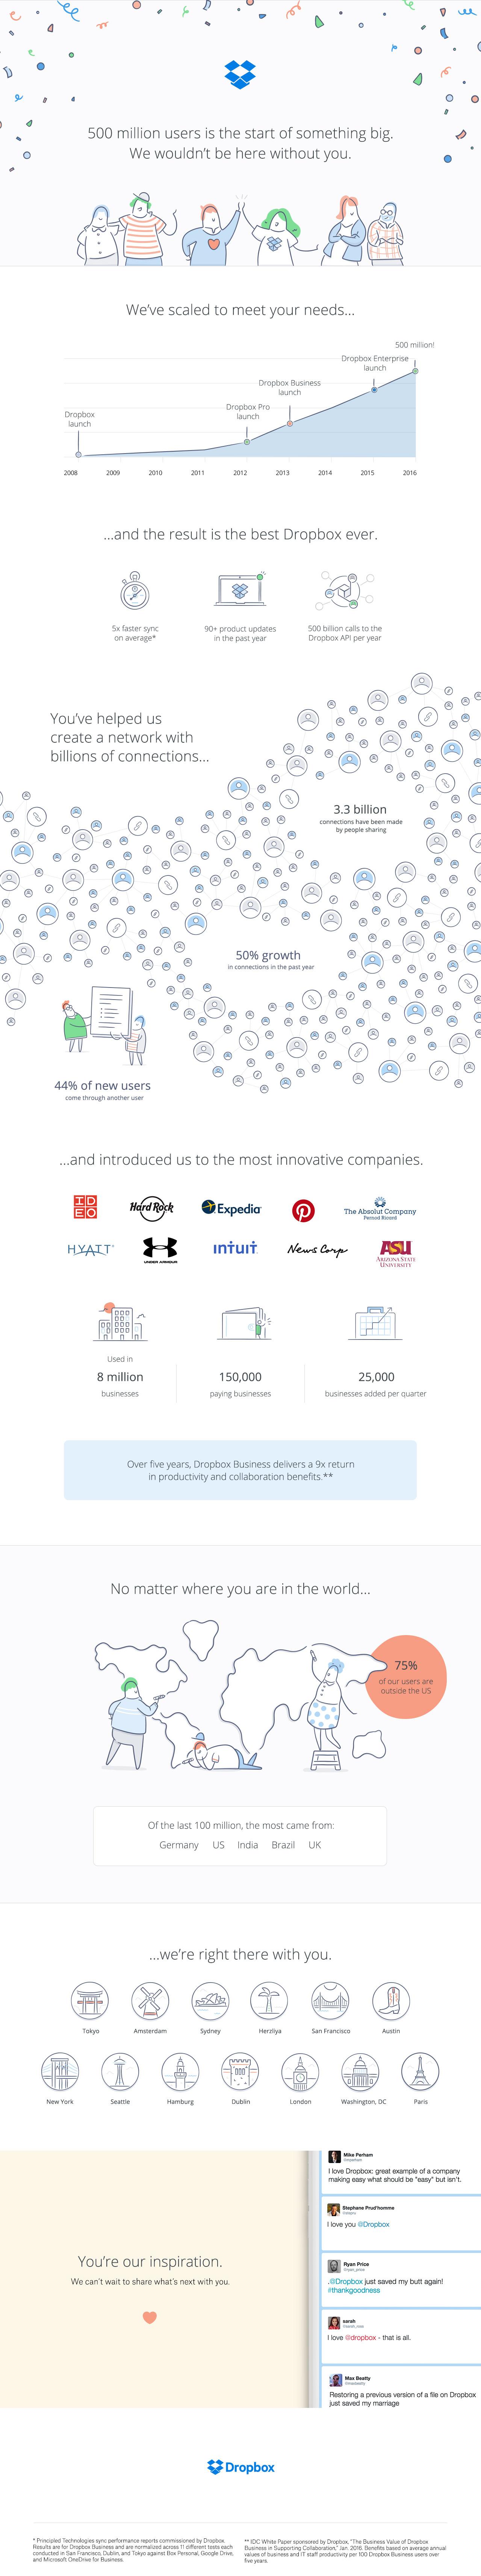 Dropbox 500 million users infographic. Follow link below for text description.